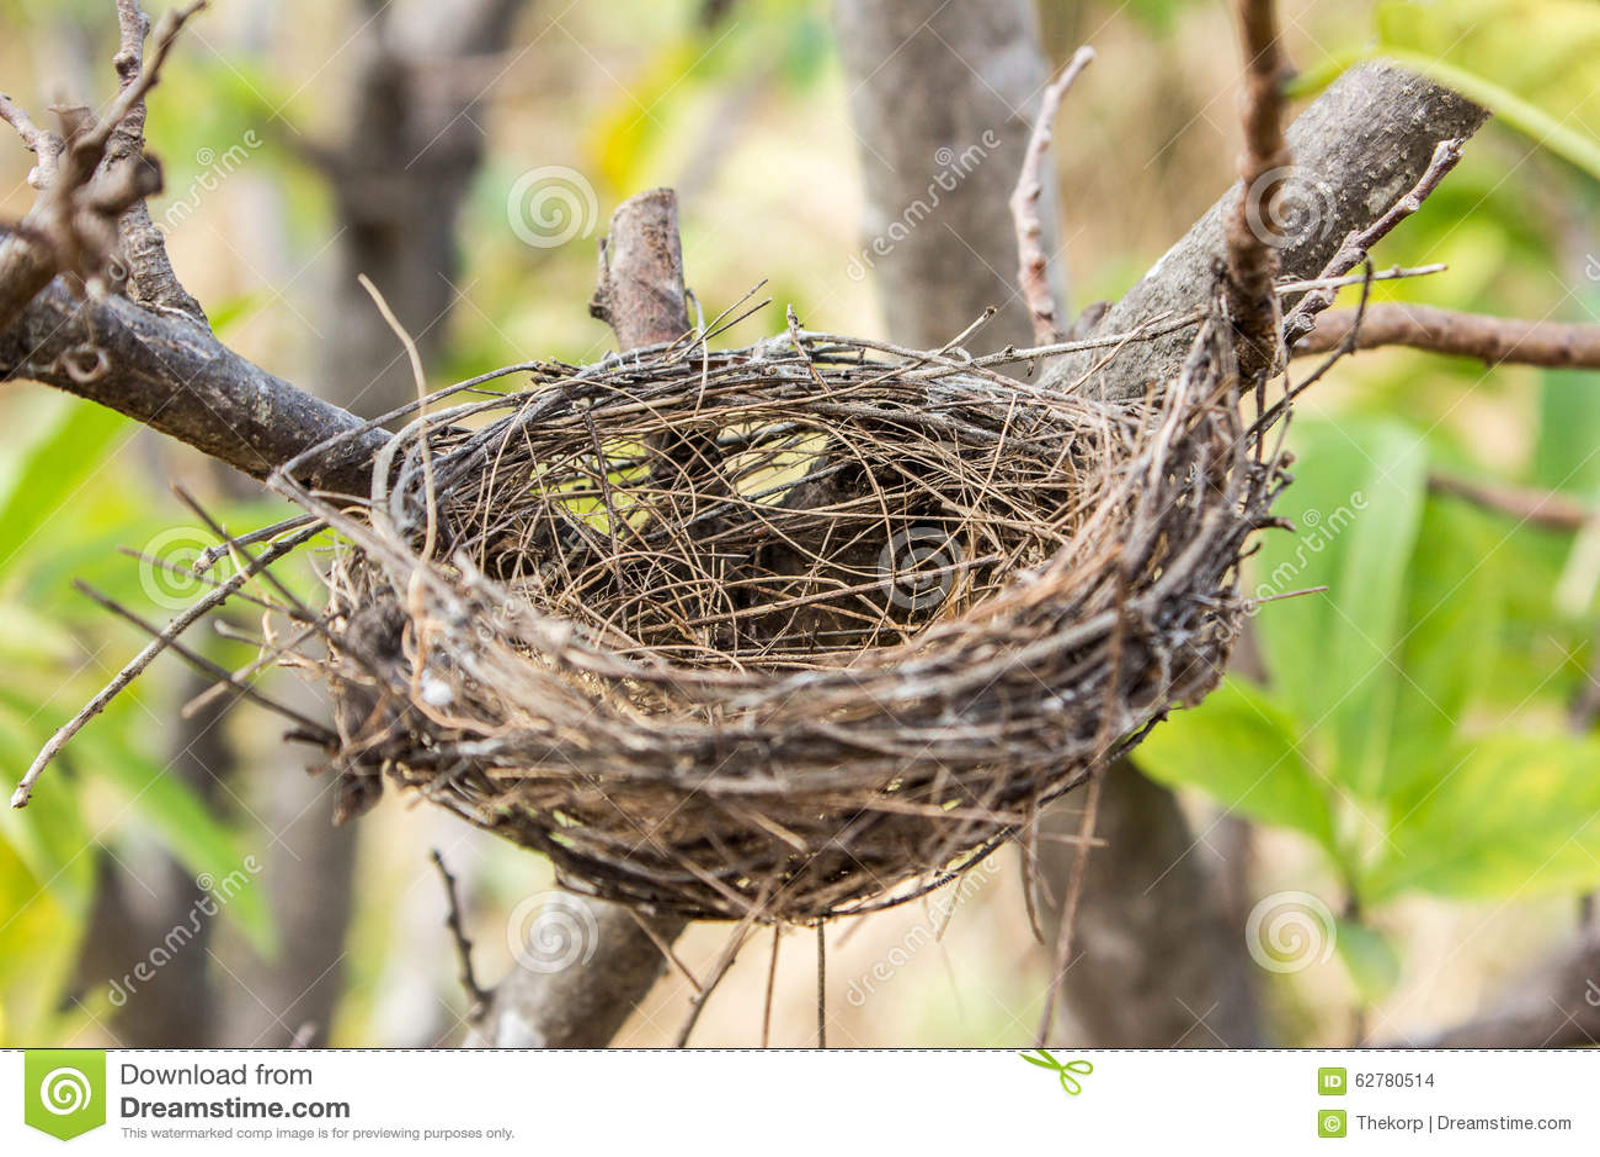 Nature Images 2mb: Empty Bird's Nest Stock Photo